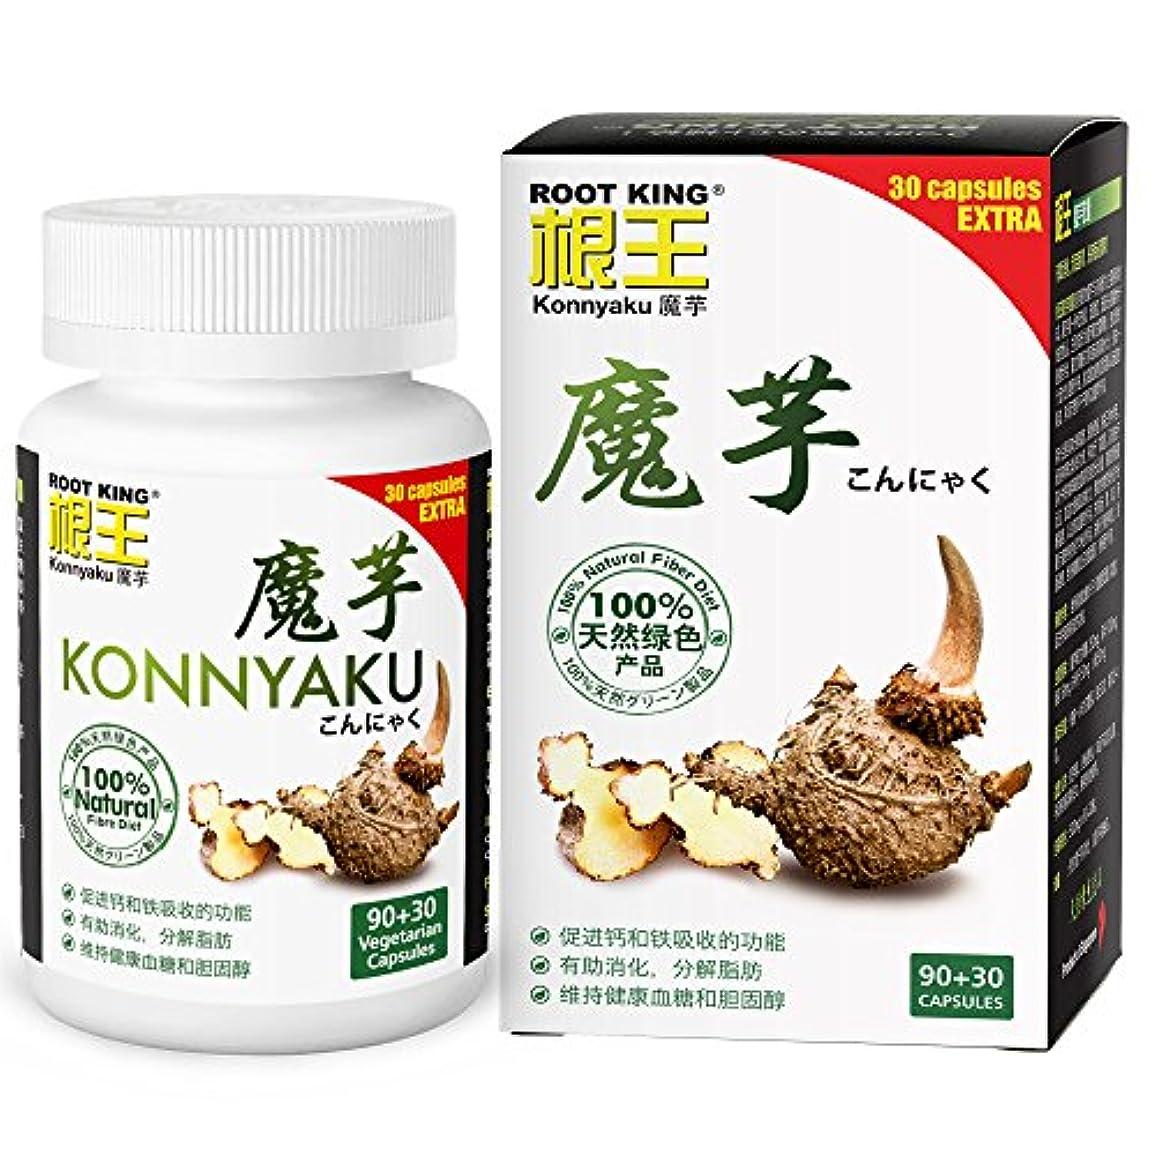 ROOT KING Konnyaku (120 Vegecaps) - control appetitide, feel fuller, contains Konjac glucomannan